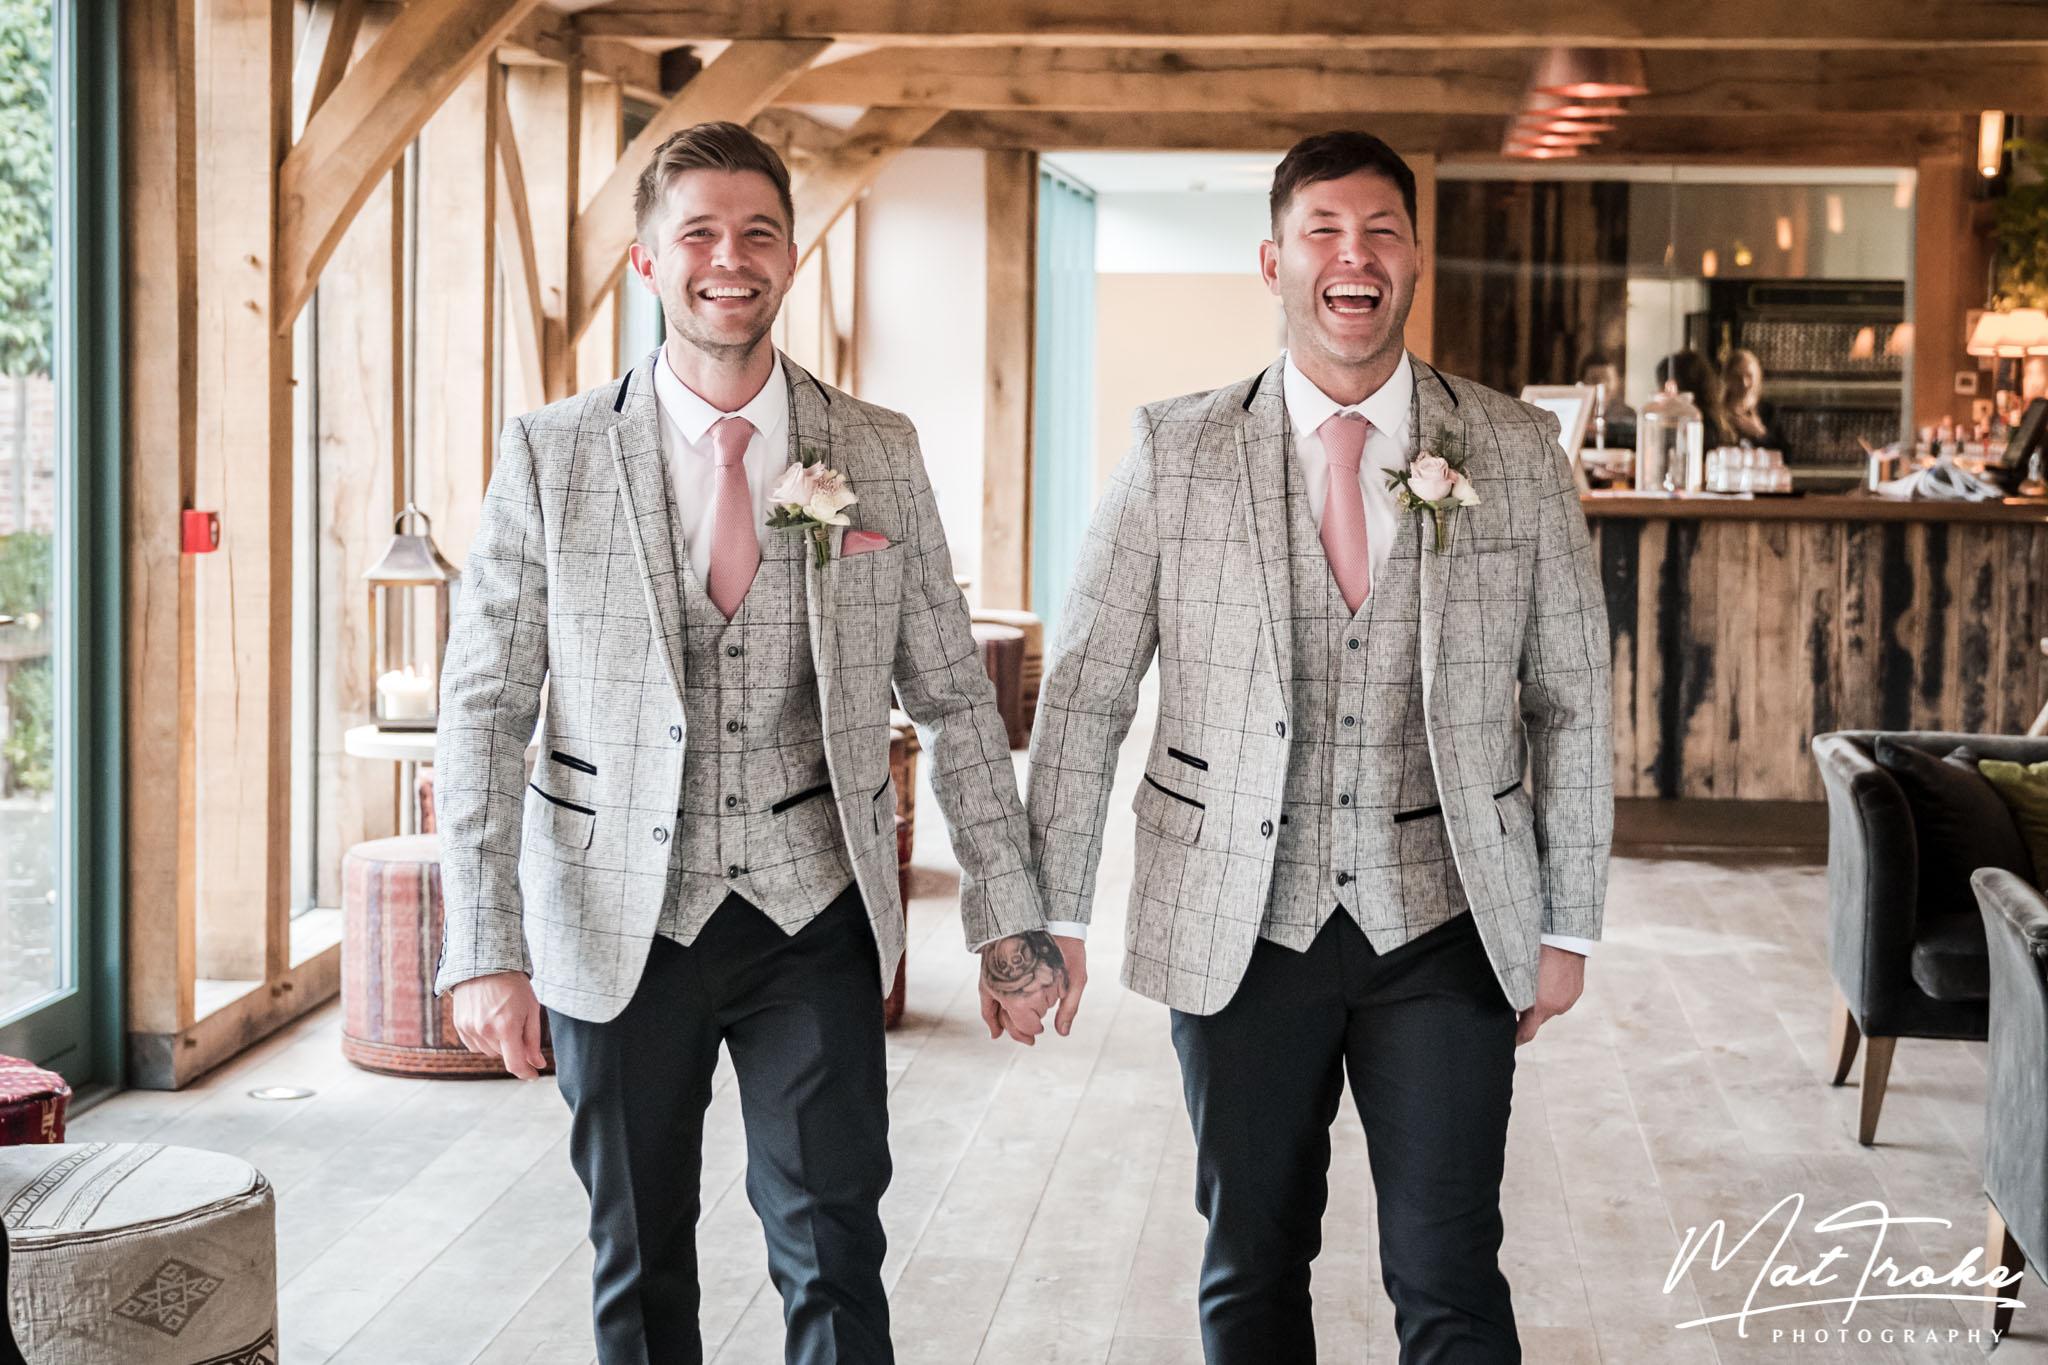 charlie and luke-39.jpghazel-gap-barn-edwinstowe-wedding-photographer